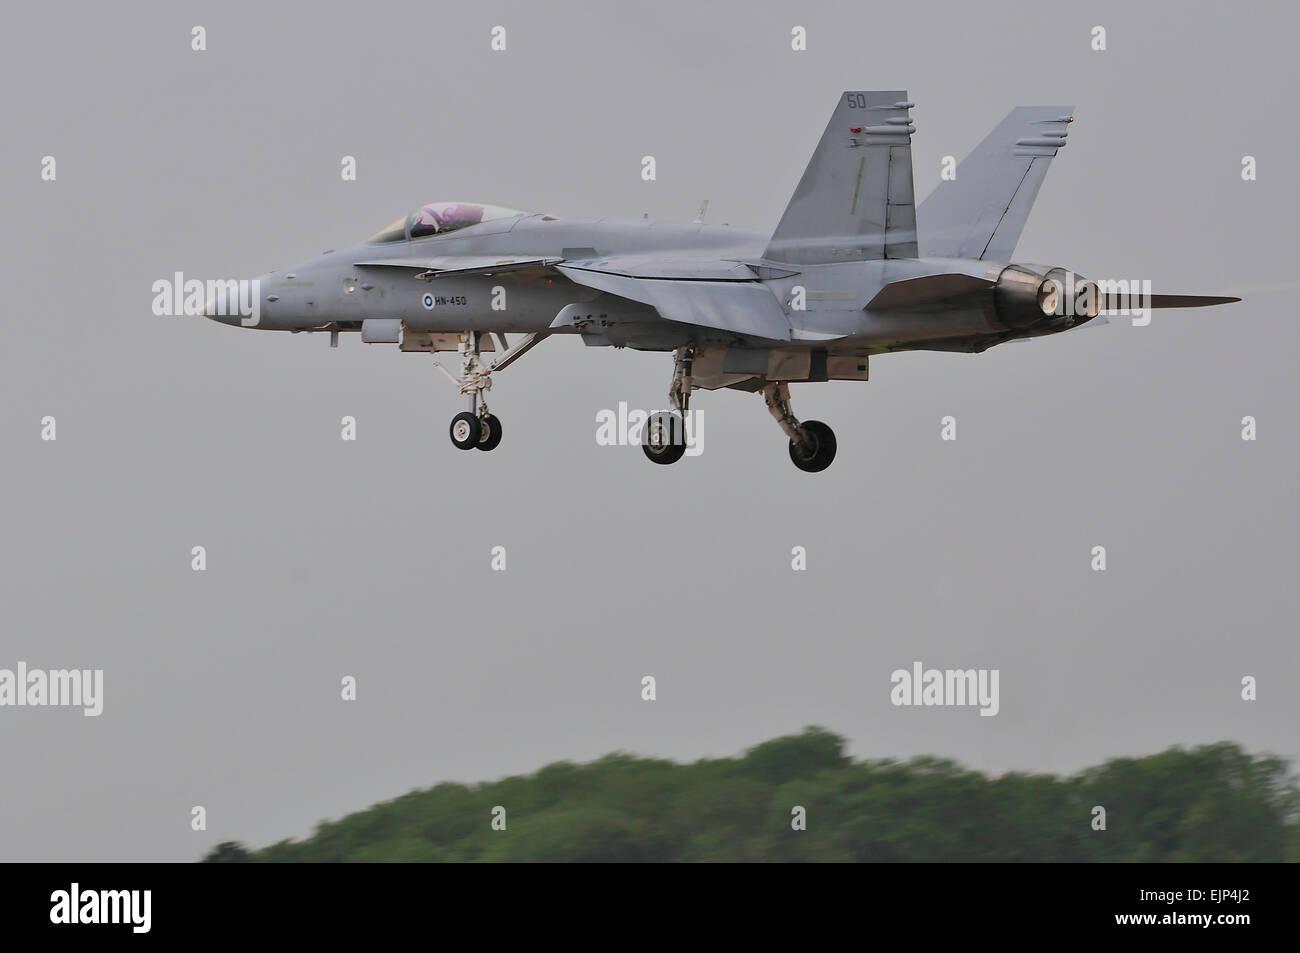 Finnish Air Force, McDonnell Douglas, F/A-18C Hornet,HN-450, RIAT, RAF, Fairford, UK, - Stock Image